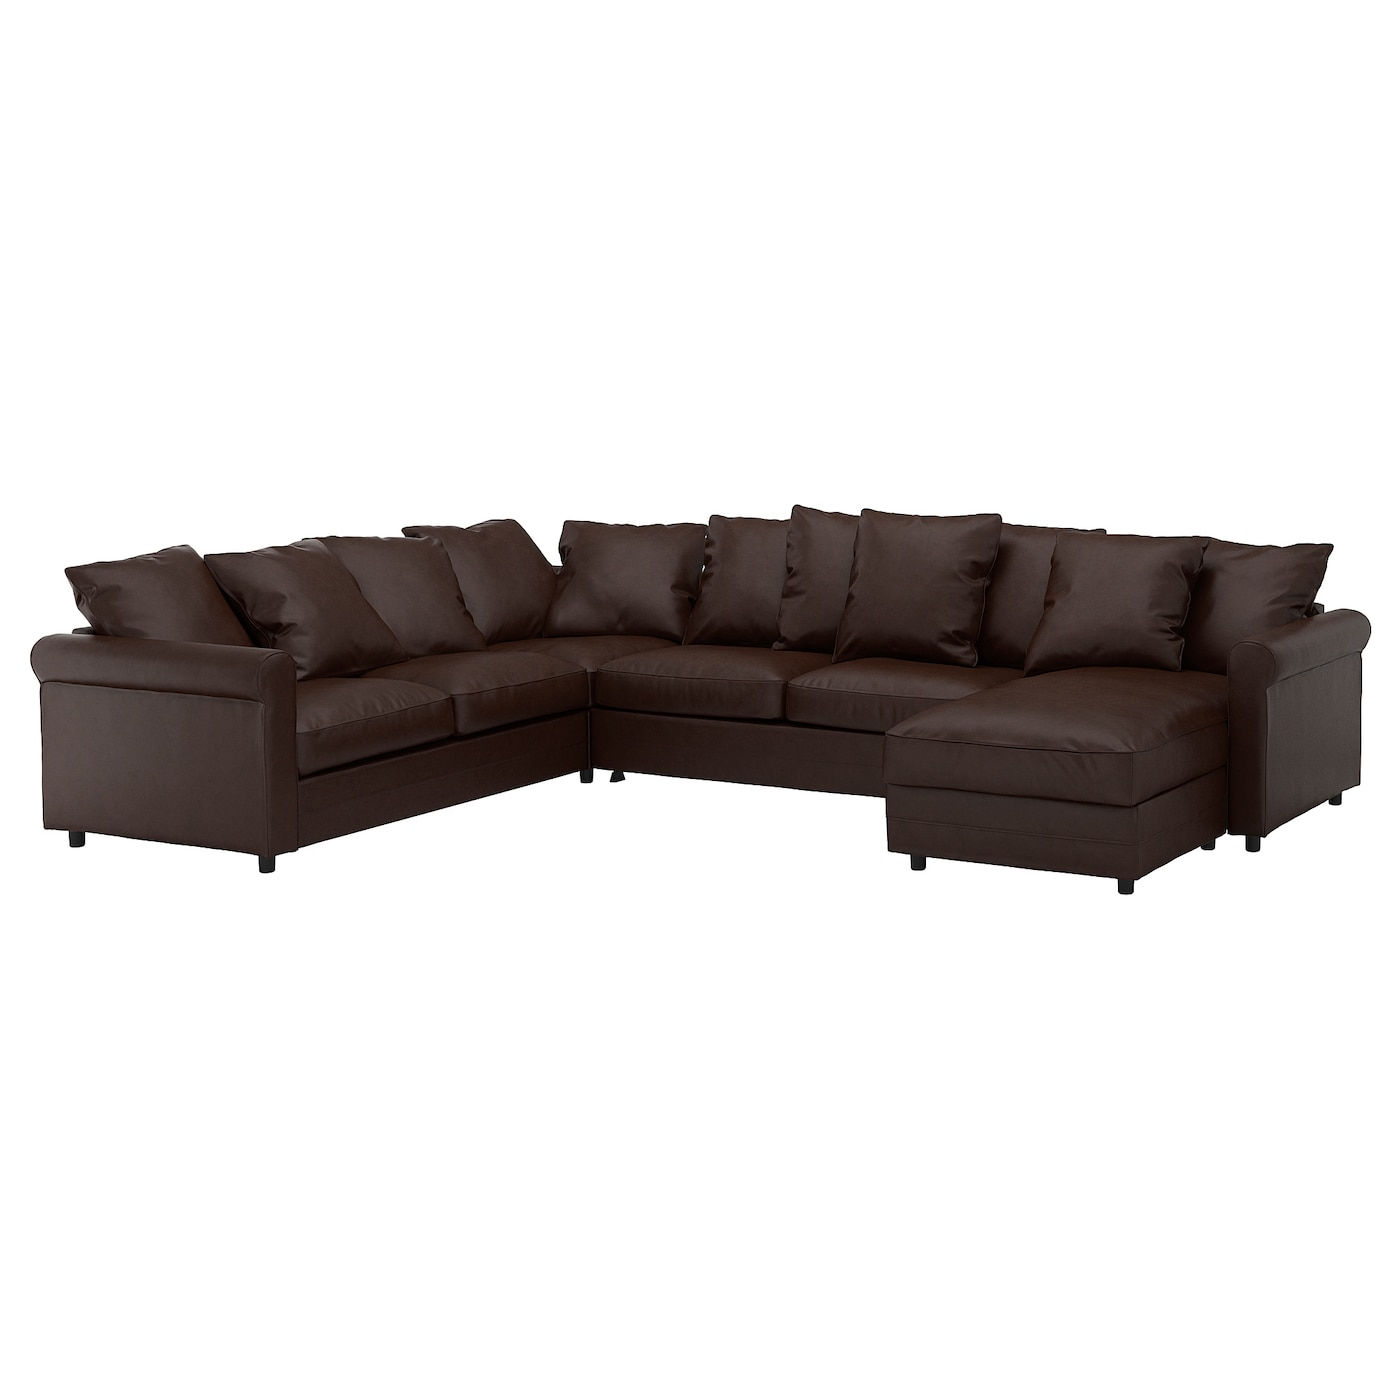 Corner Sleeper Sofa 5 Seat Gronlid With Chaise Kimstad Dark Brown